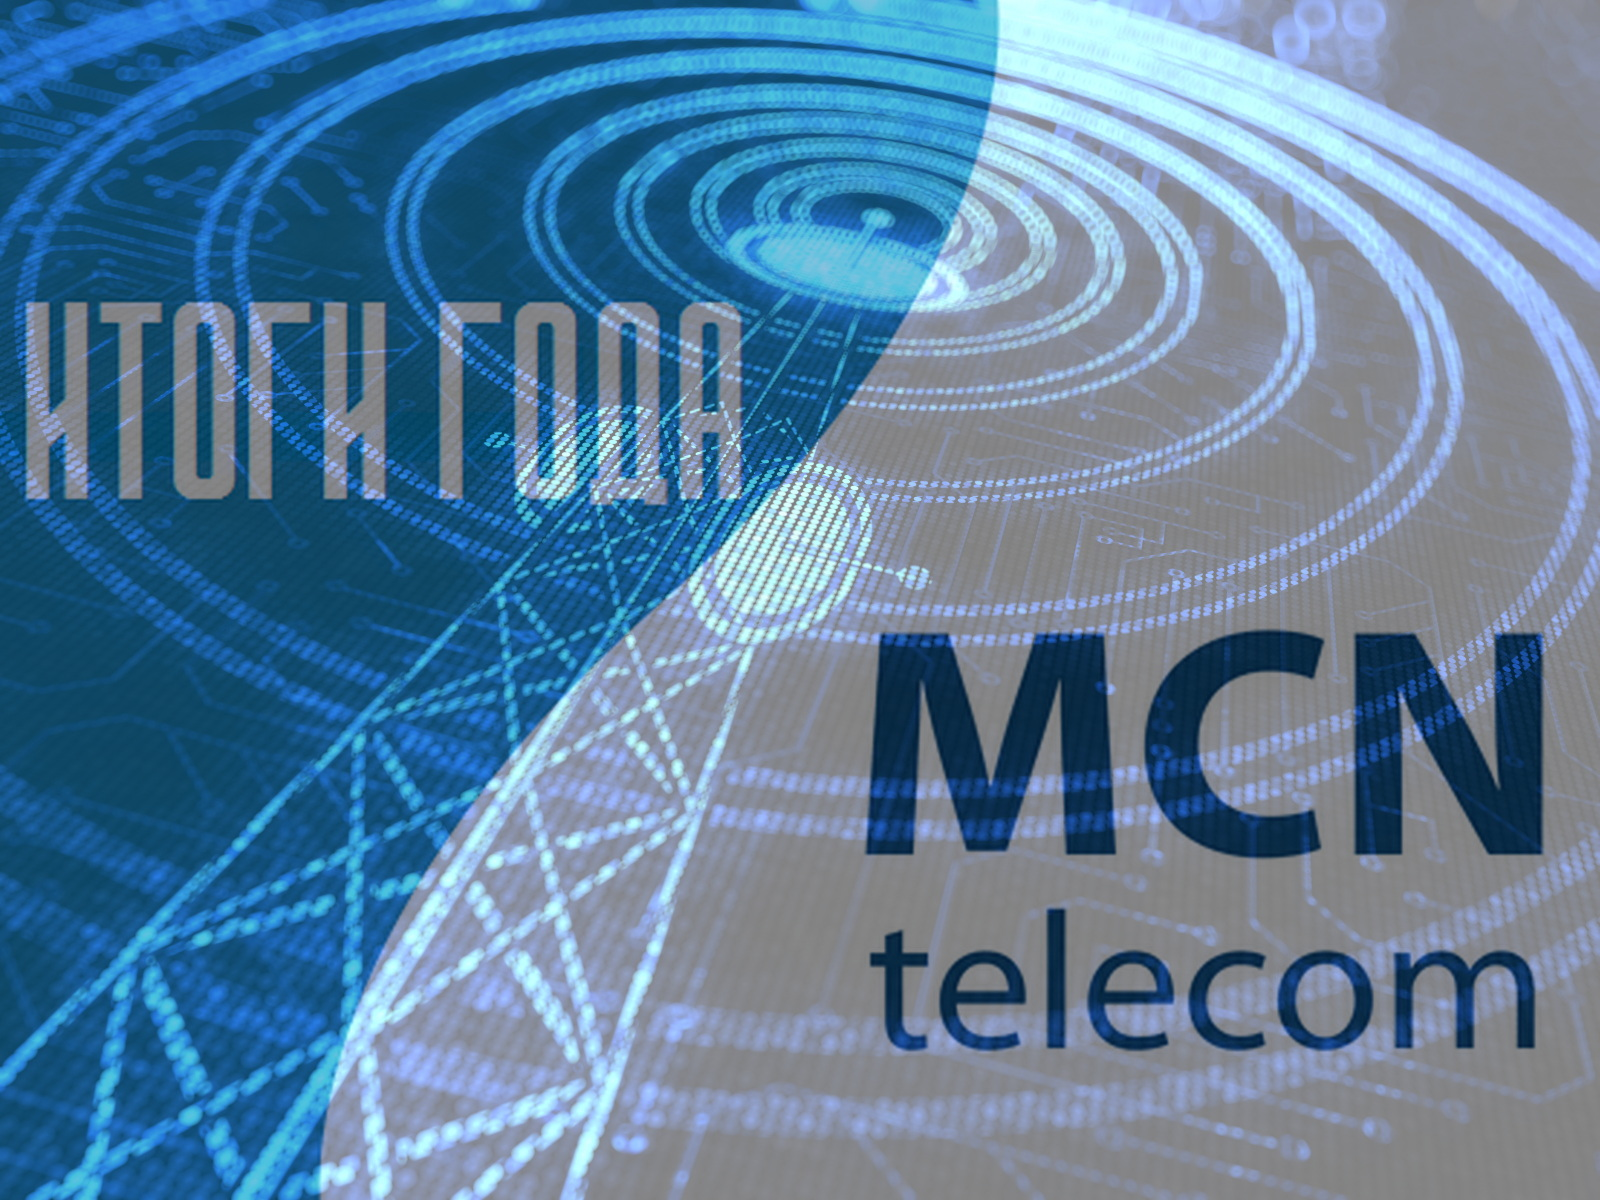 Итоги 2020 года MCN Telecom 1